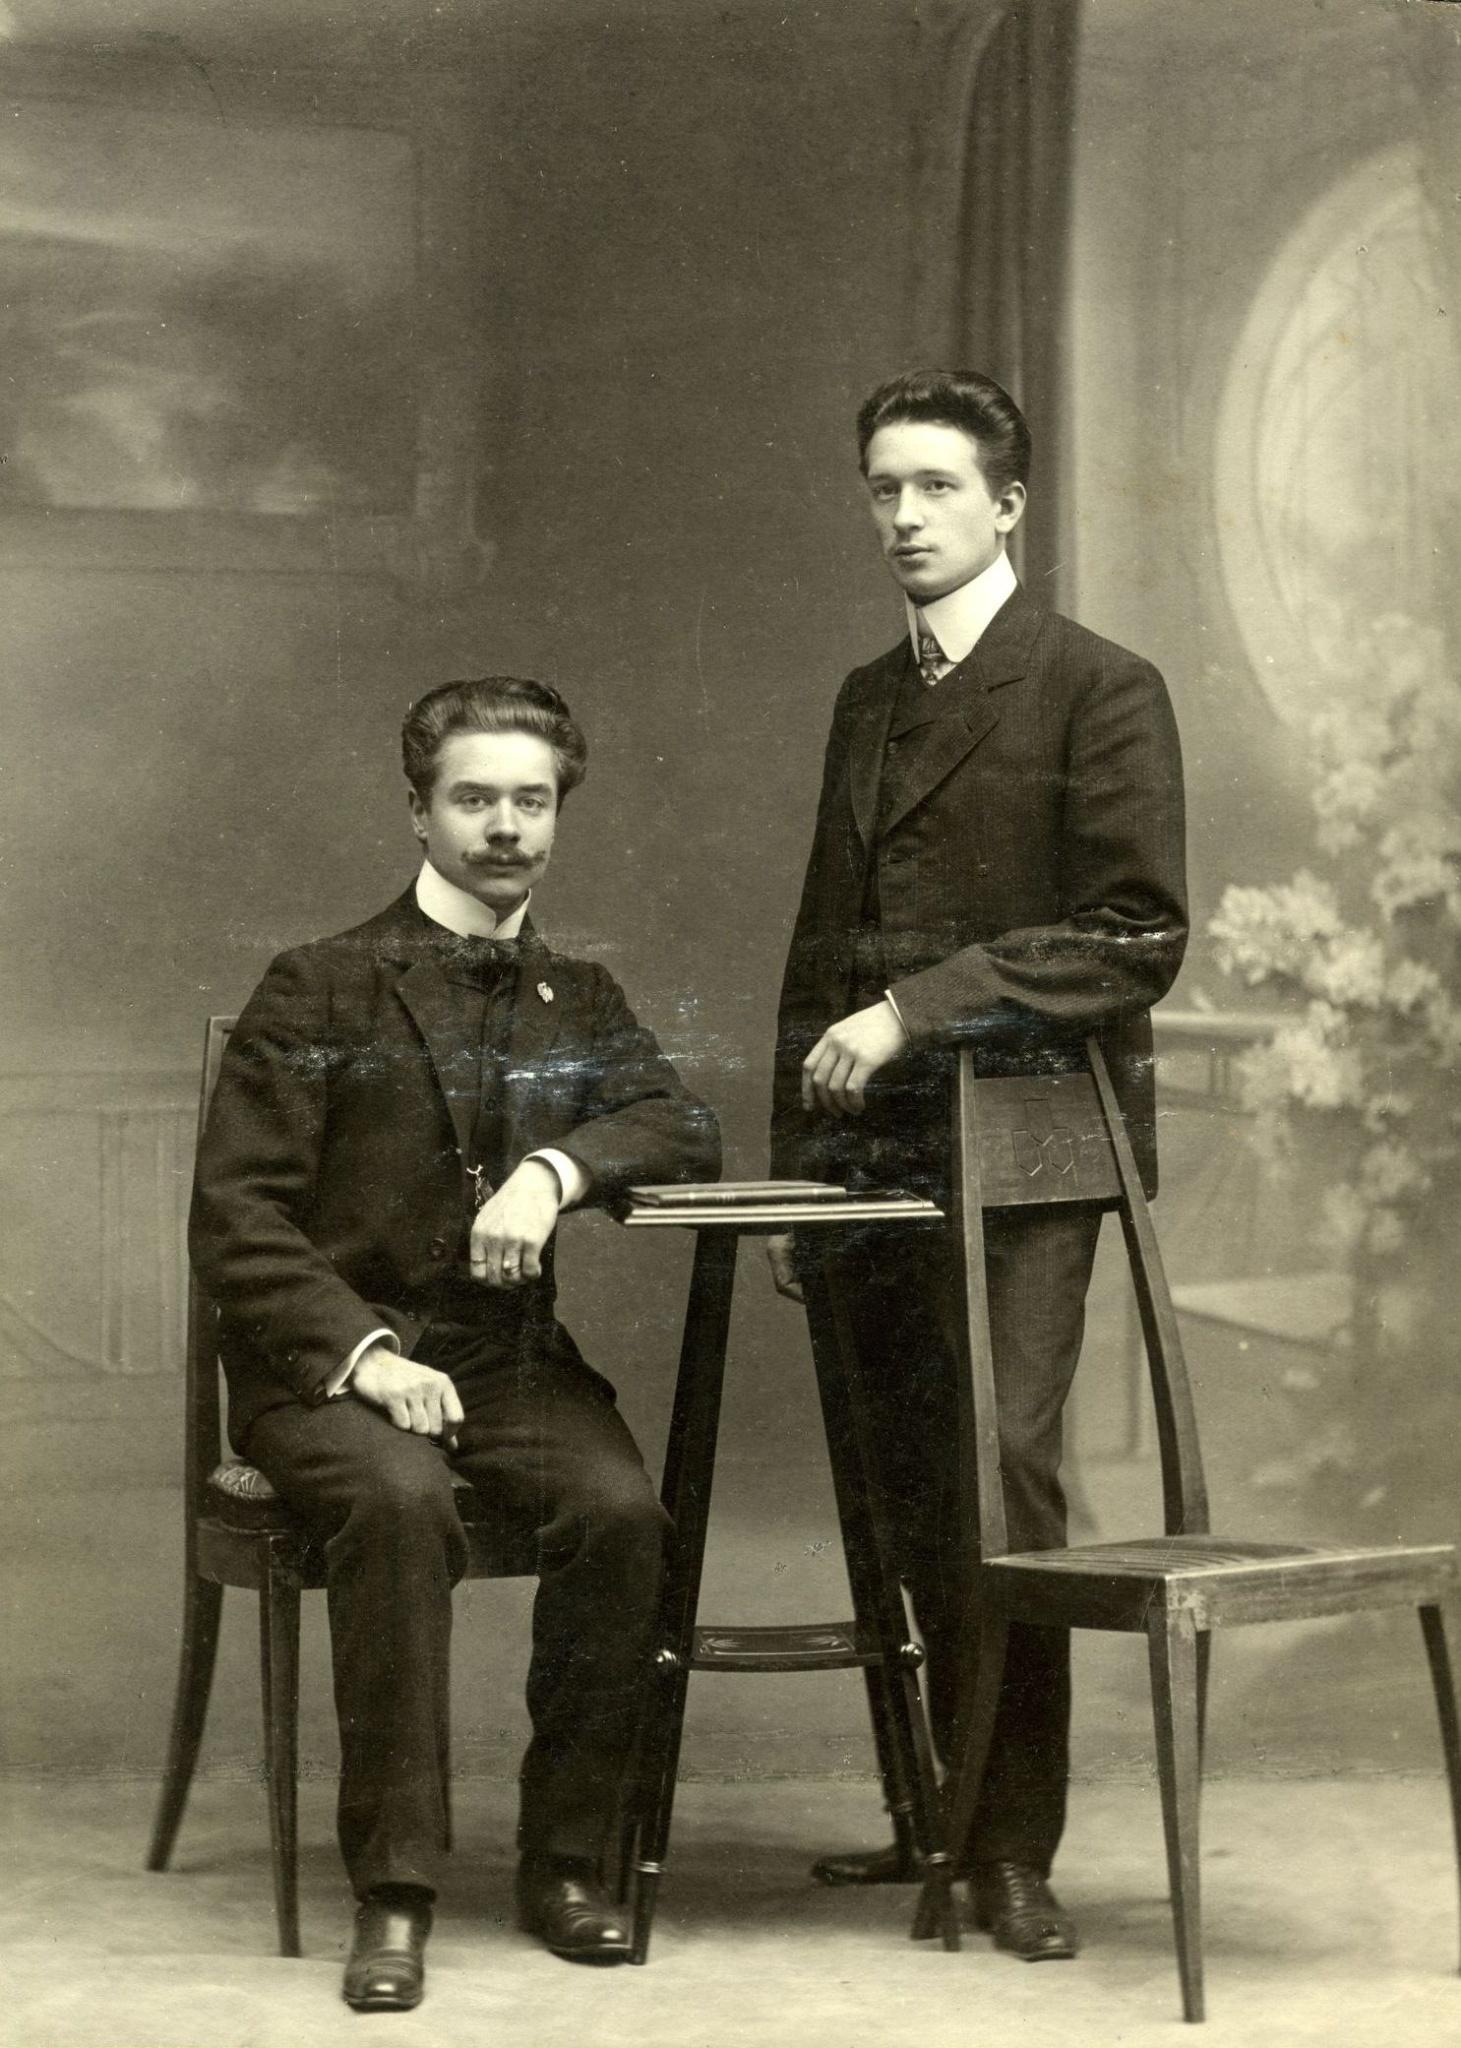 <div class='inner-box'><div class='close-desc'></div><span class='opis'>Ignacy Giedroyć. Moskwa, zdjęcie z lat 1900-1920</span><div class='clearfix'></div><span>Sygn. FIL03435</span><div class='clearfix'></div><span>© Instytut Literacki</span></div>